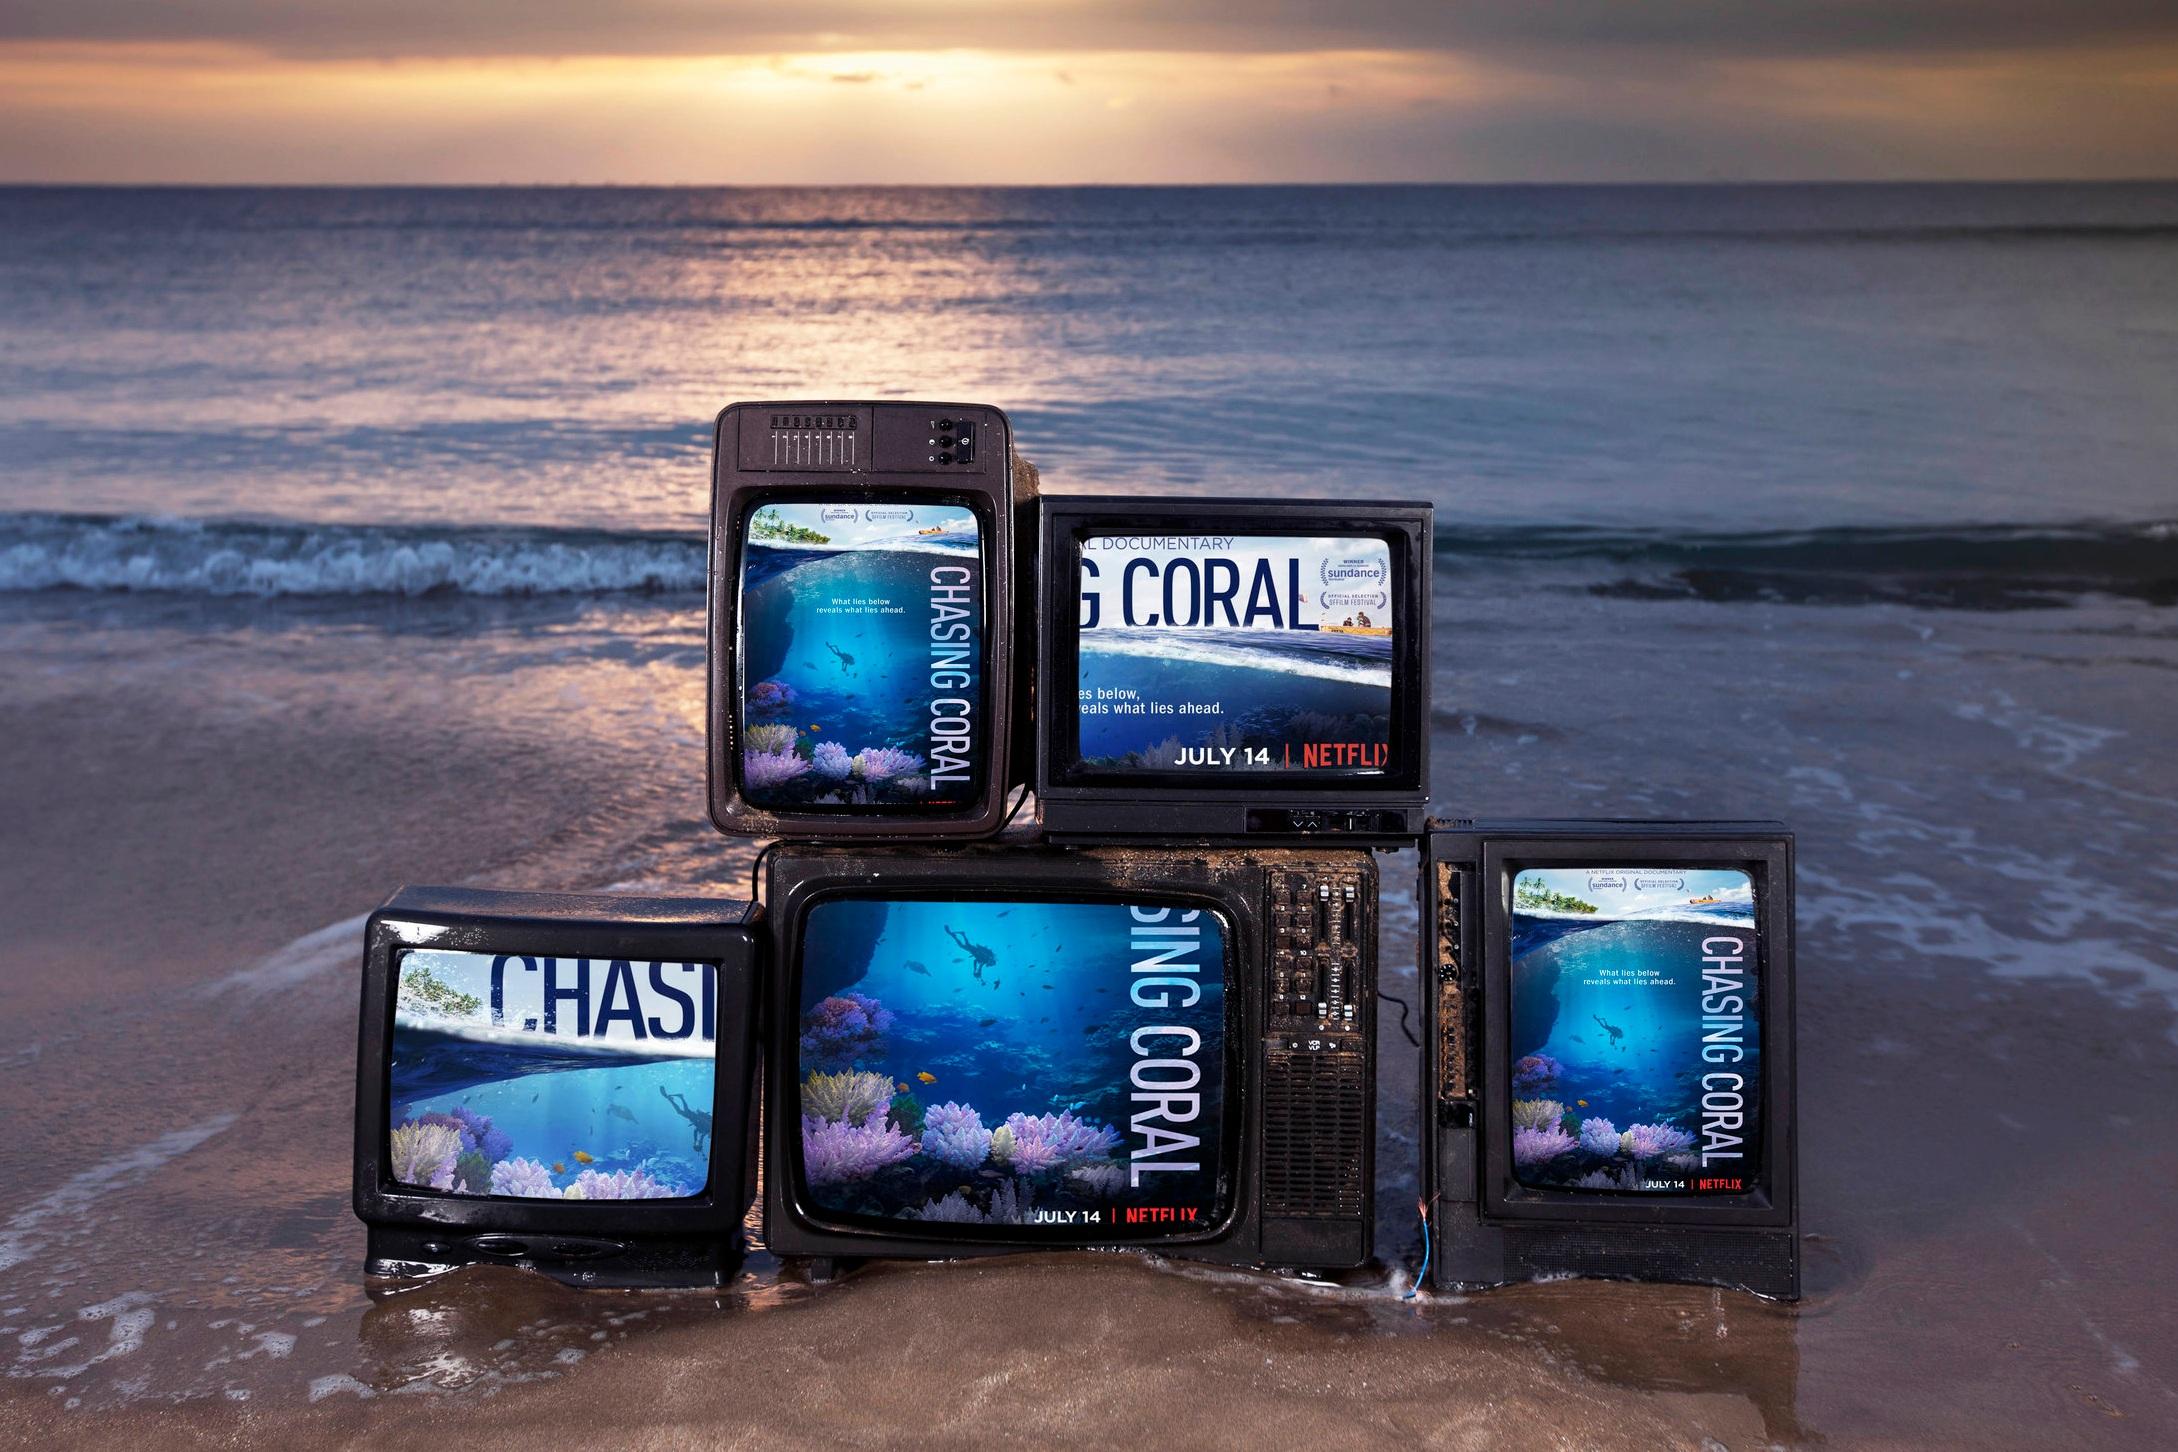 TheOceanAgency -  Netflix ChasingCoral tvs on beach.jpg